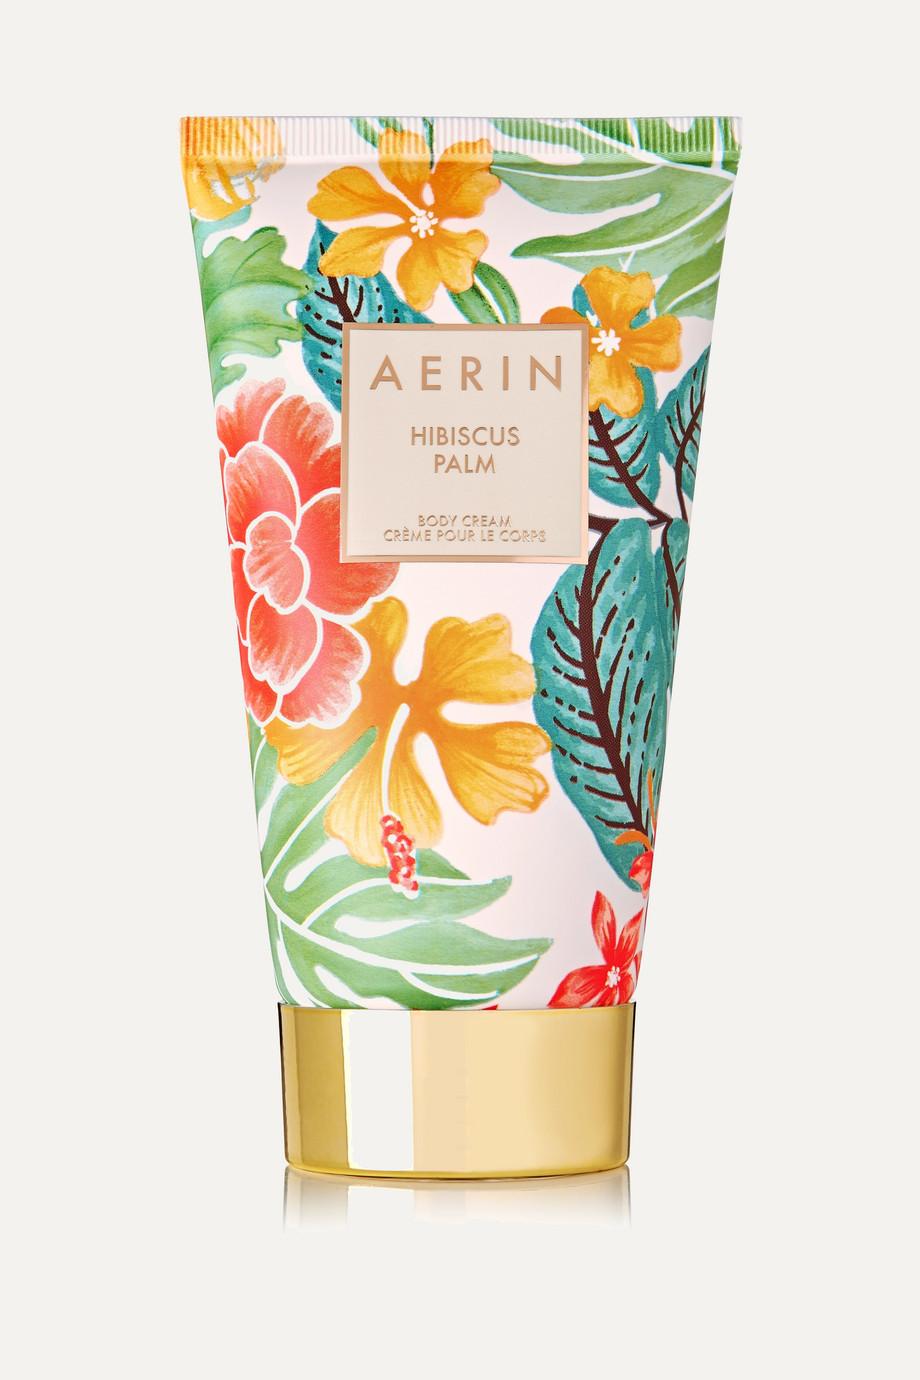 AERIN Beauty Hibiscus Palm Body Cream, 150 ml – Körpercreme